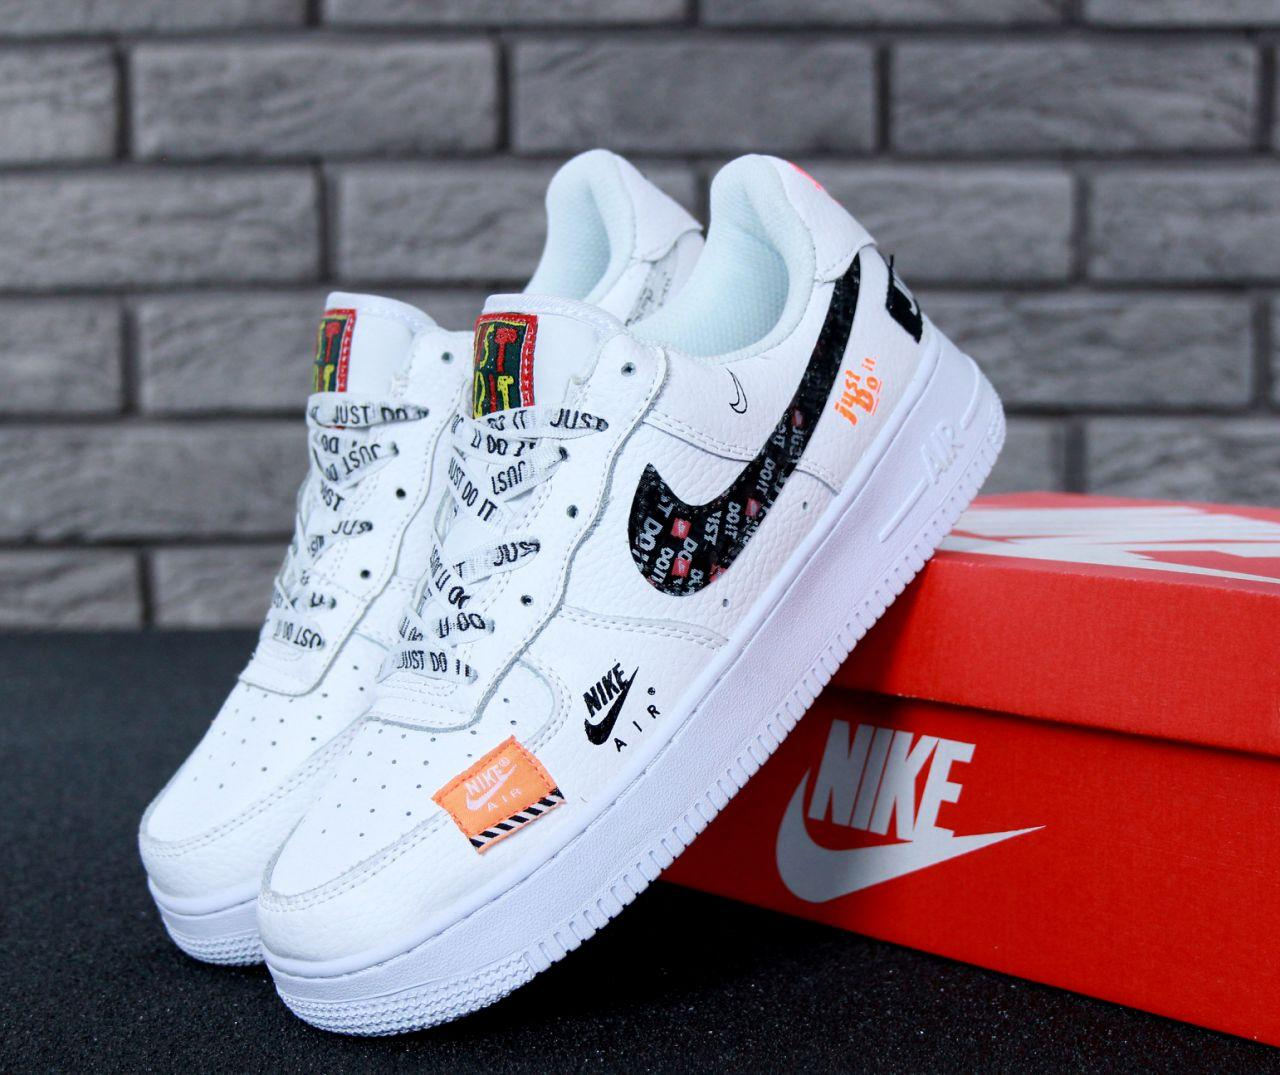 d6882eb3 Мужские кроссовки Nike Air Force 1 Low Just Do It Pack White. Живое фото  (Реплика ААА+)